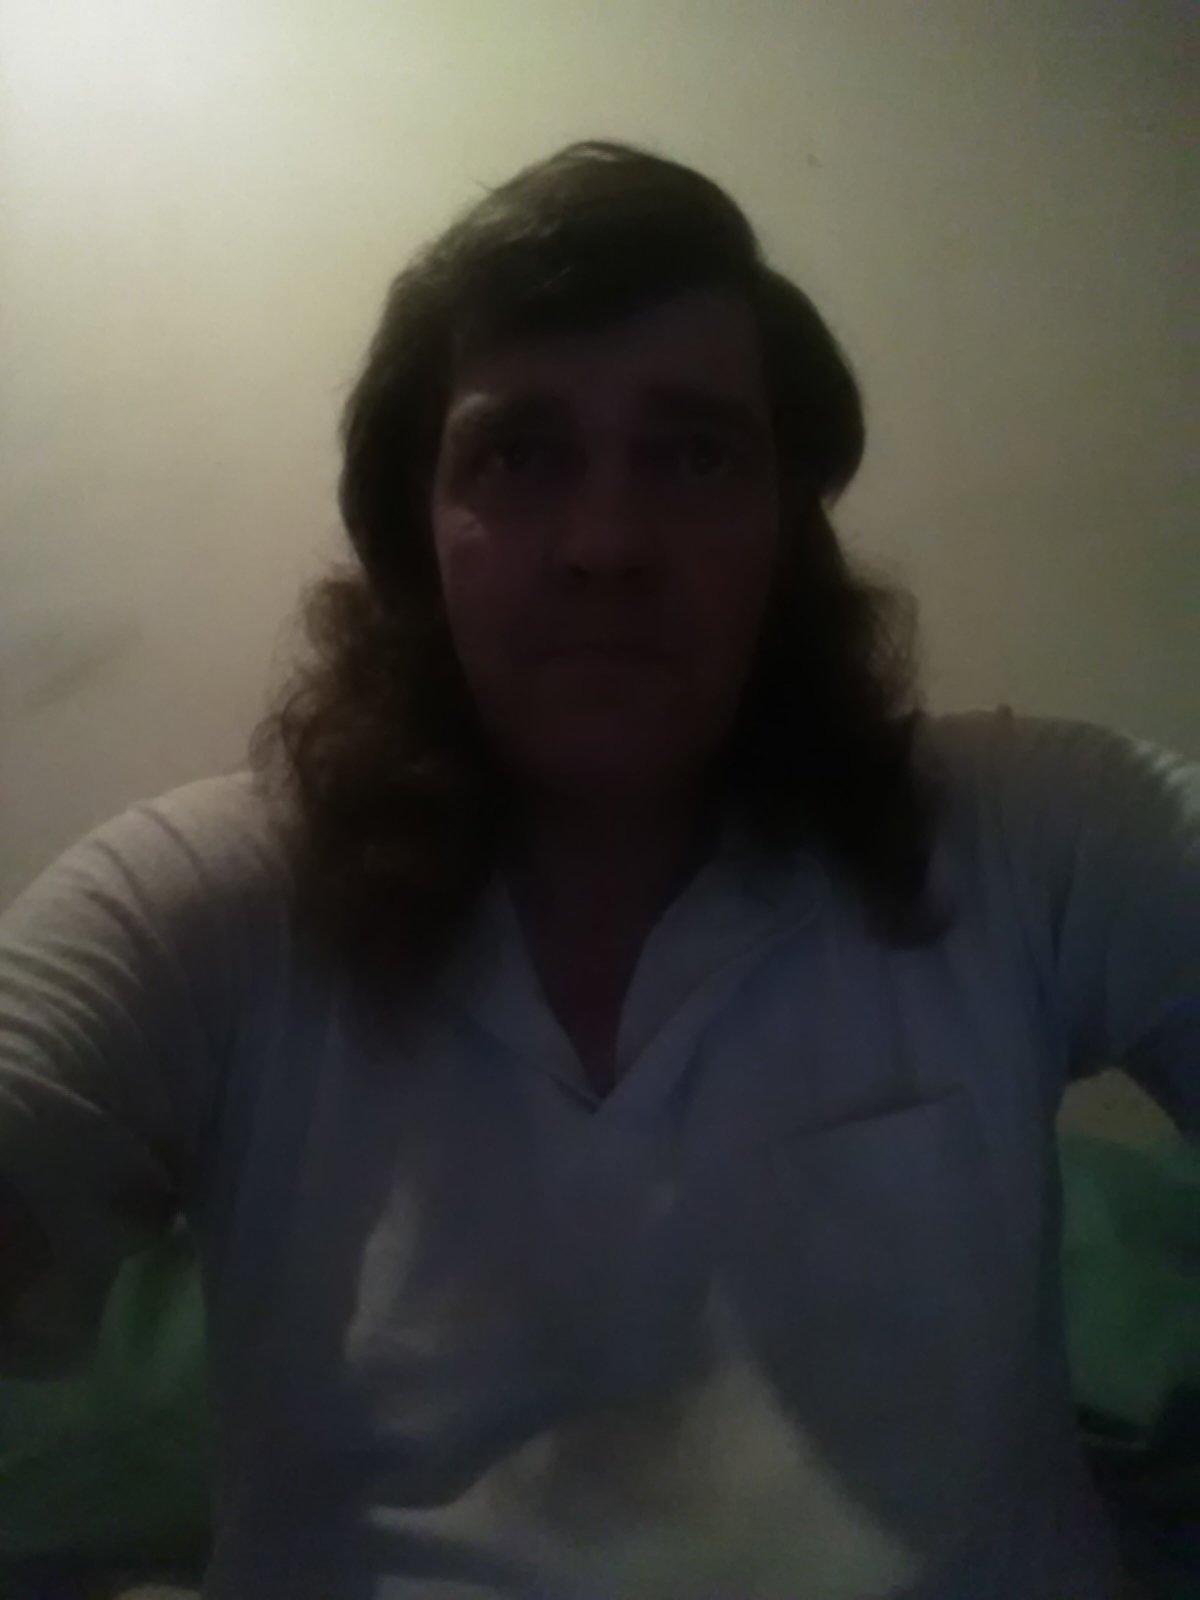 MICHAEL45 from South Australia,Australia